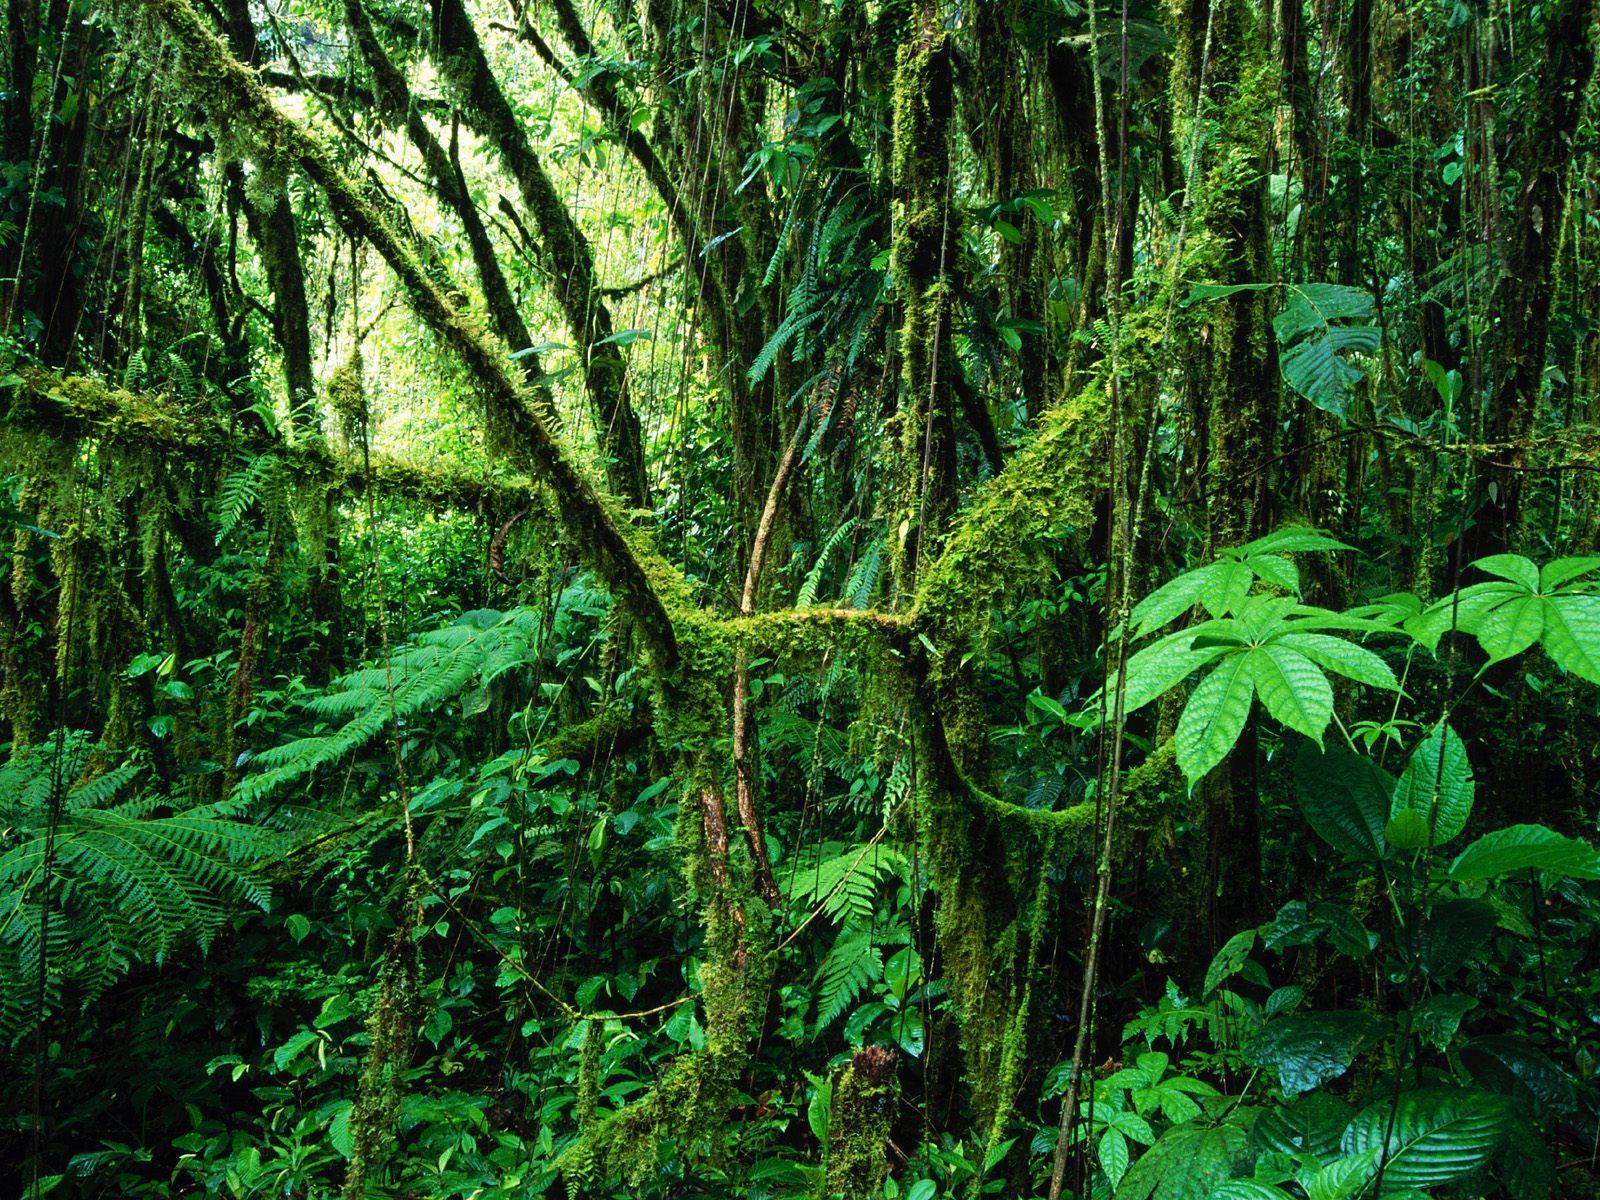 Download Rainforest Wallpaper Hd 1600x1200 43 Tropical Jungle